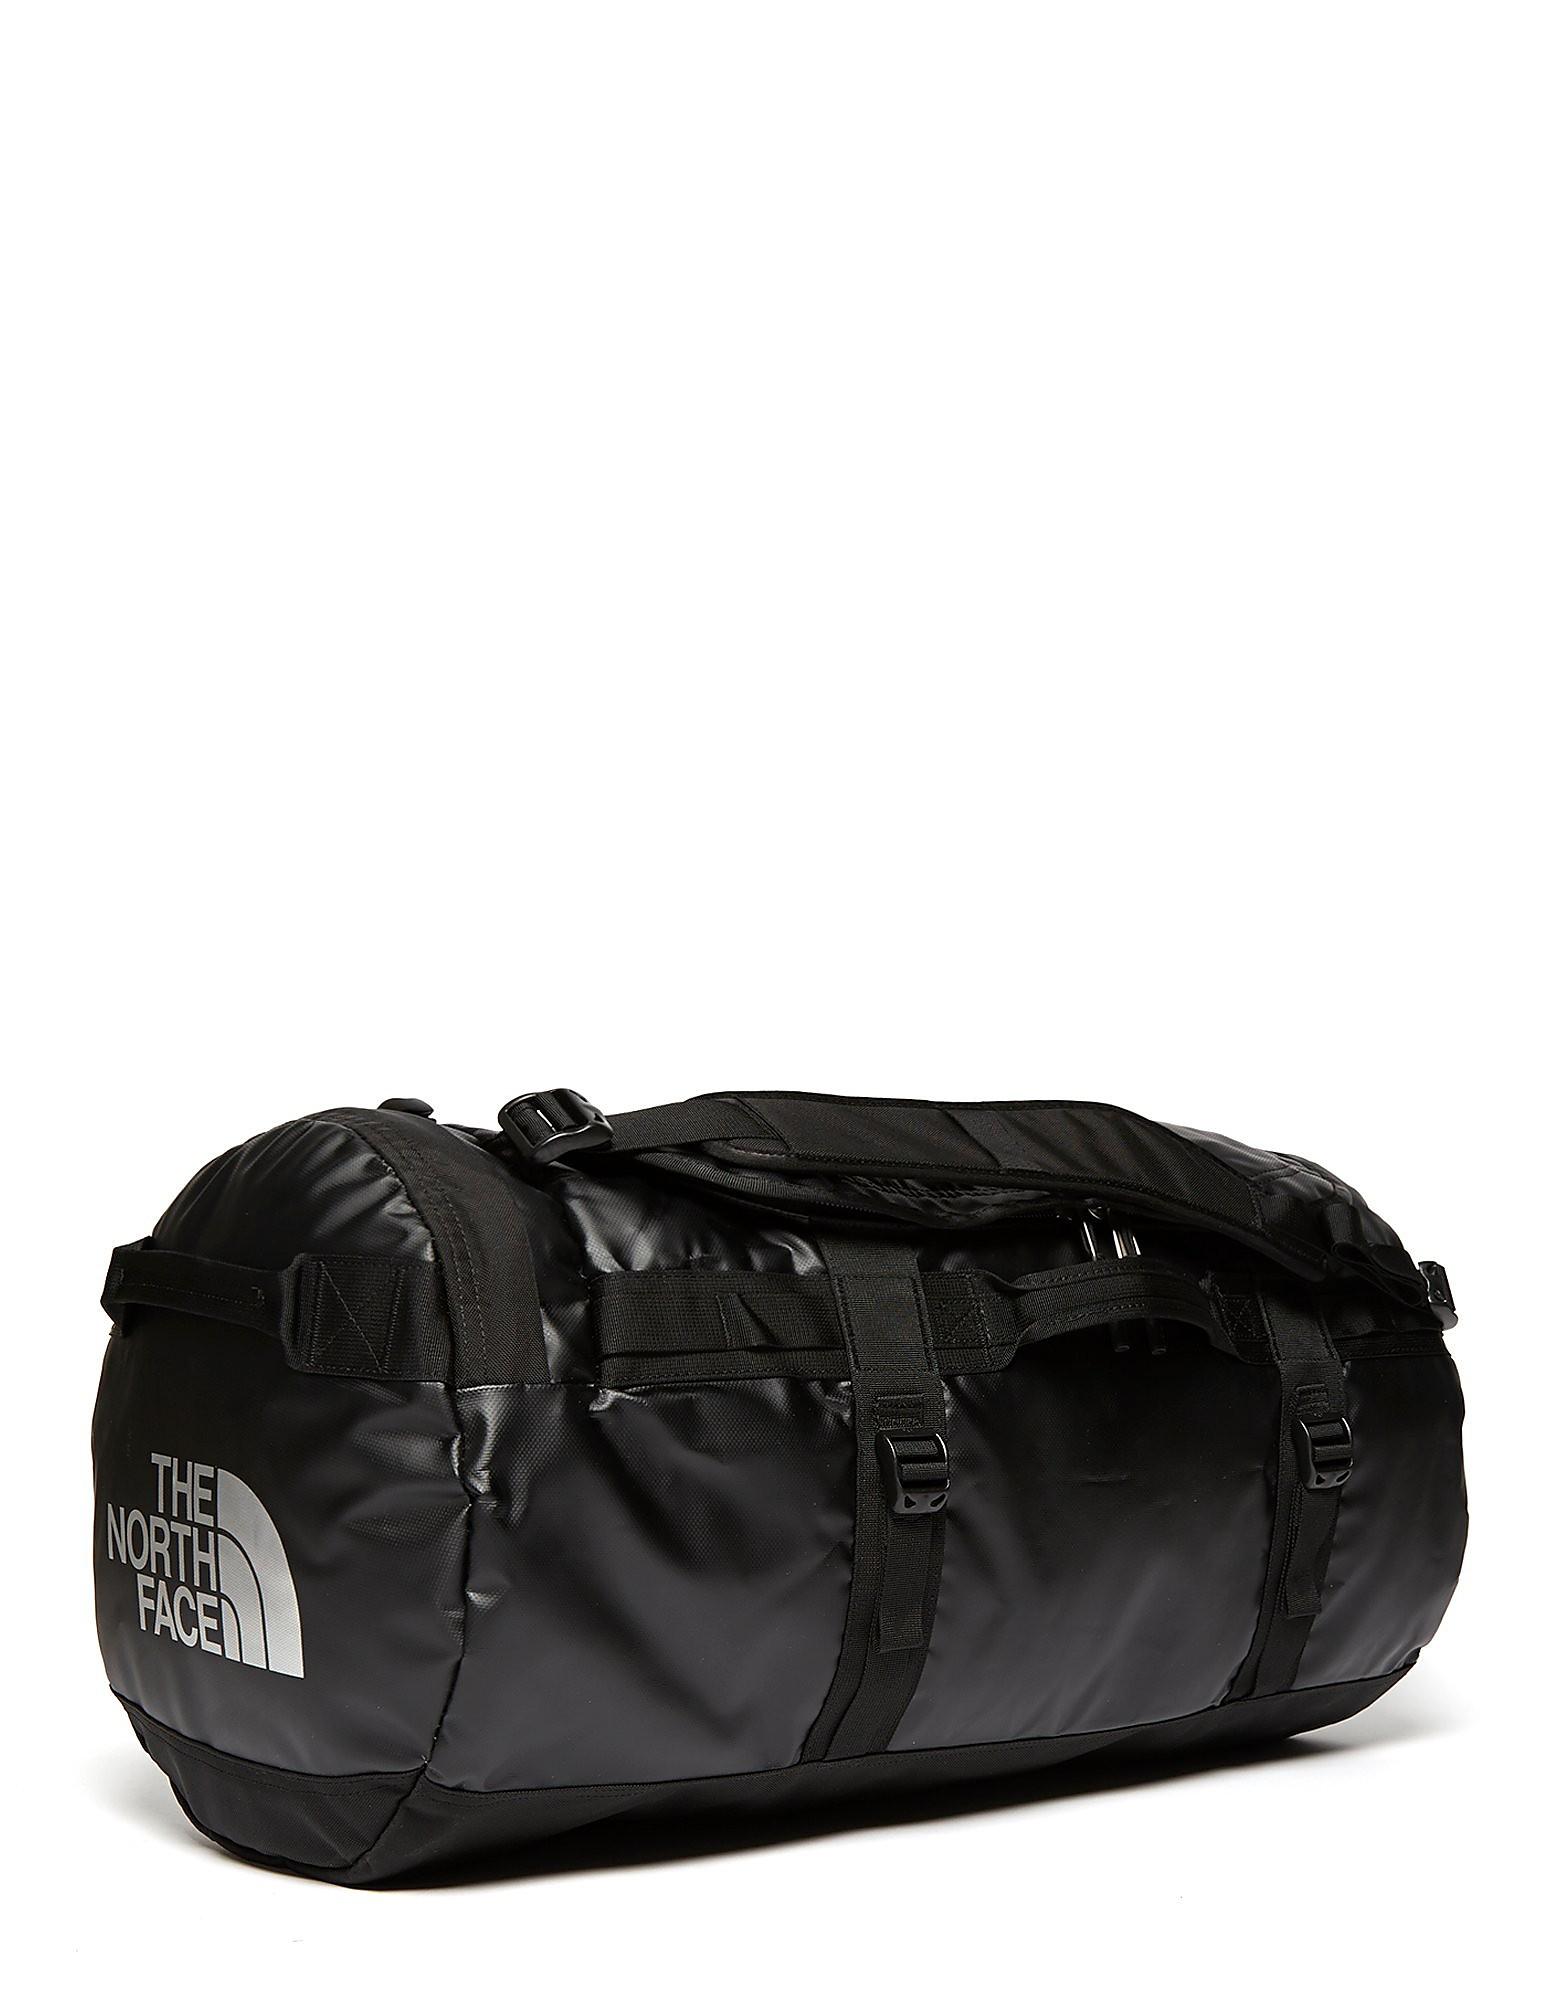 The North Face Medium Base Camp Duffel Bag